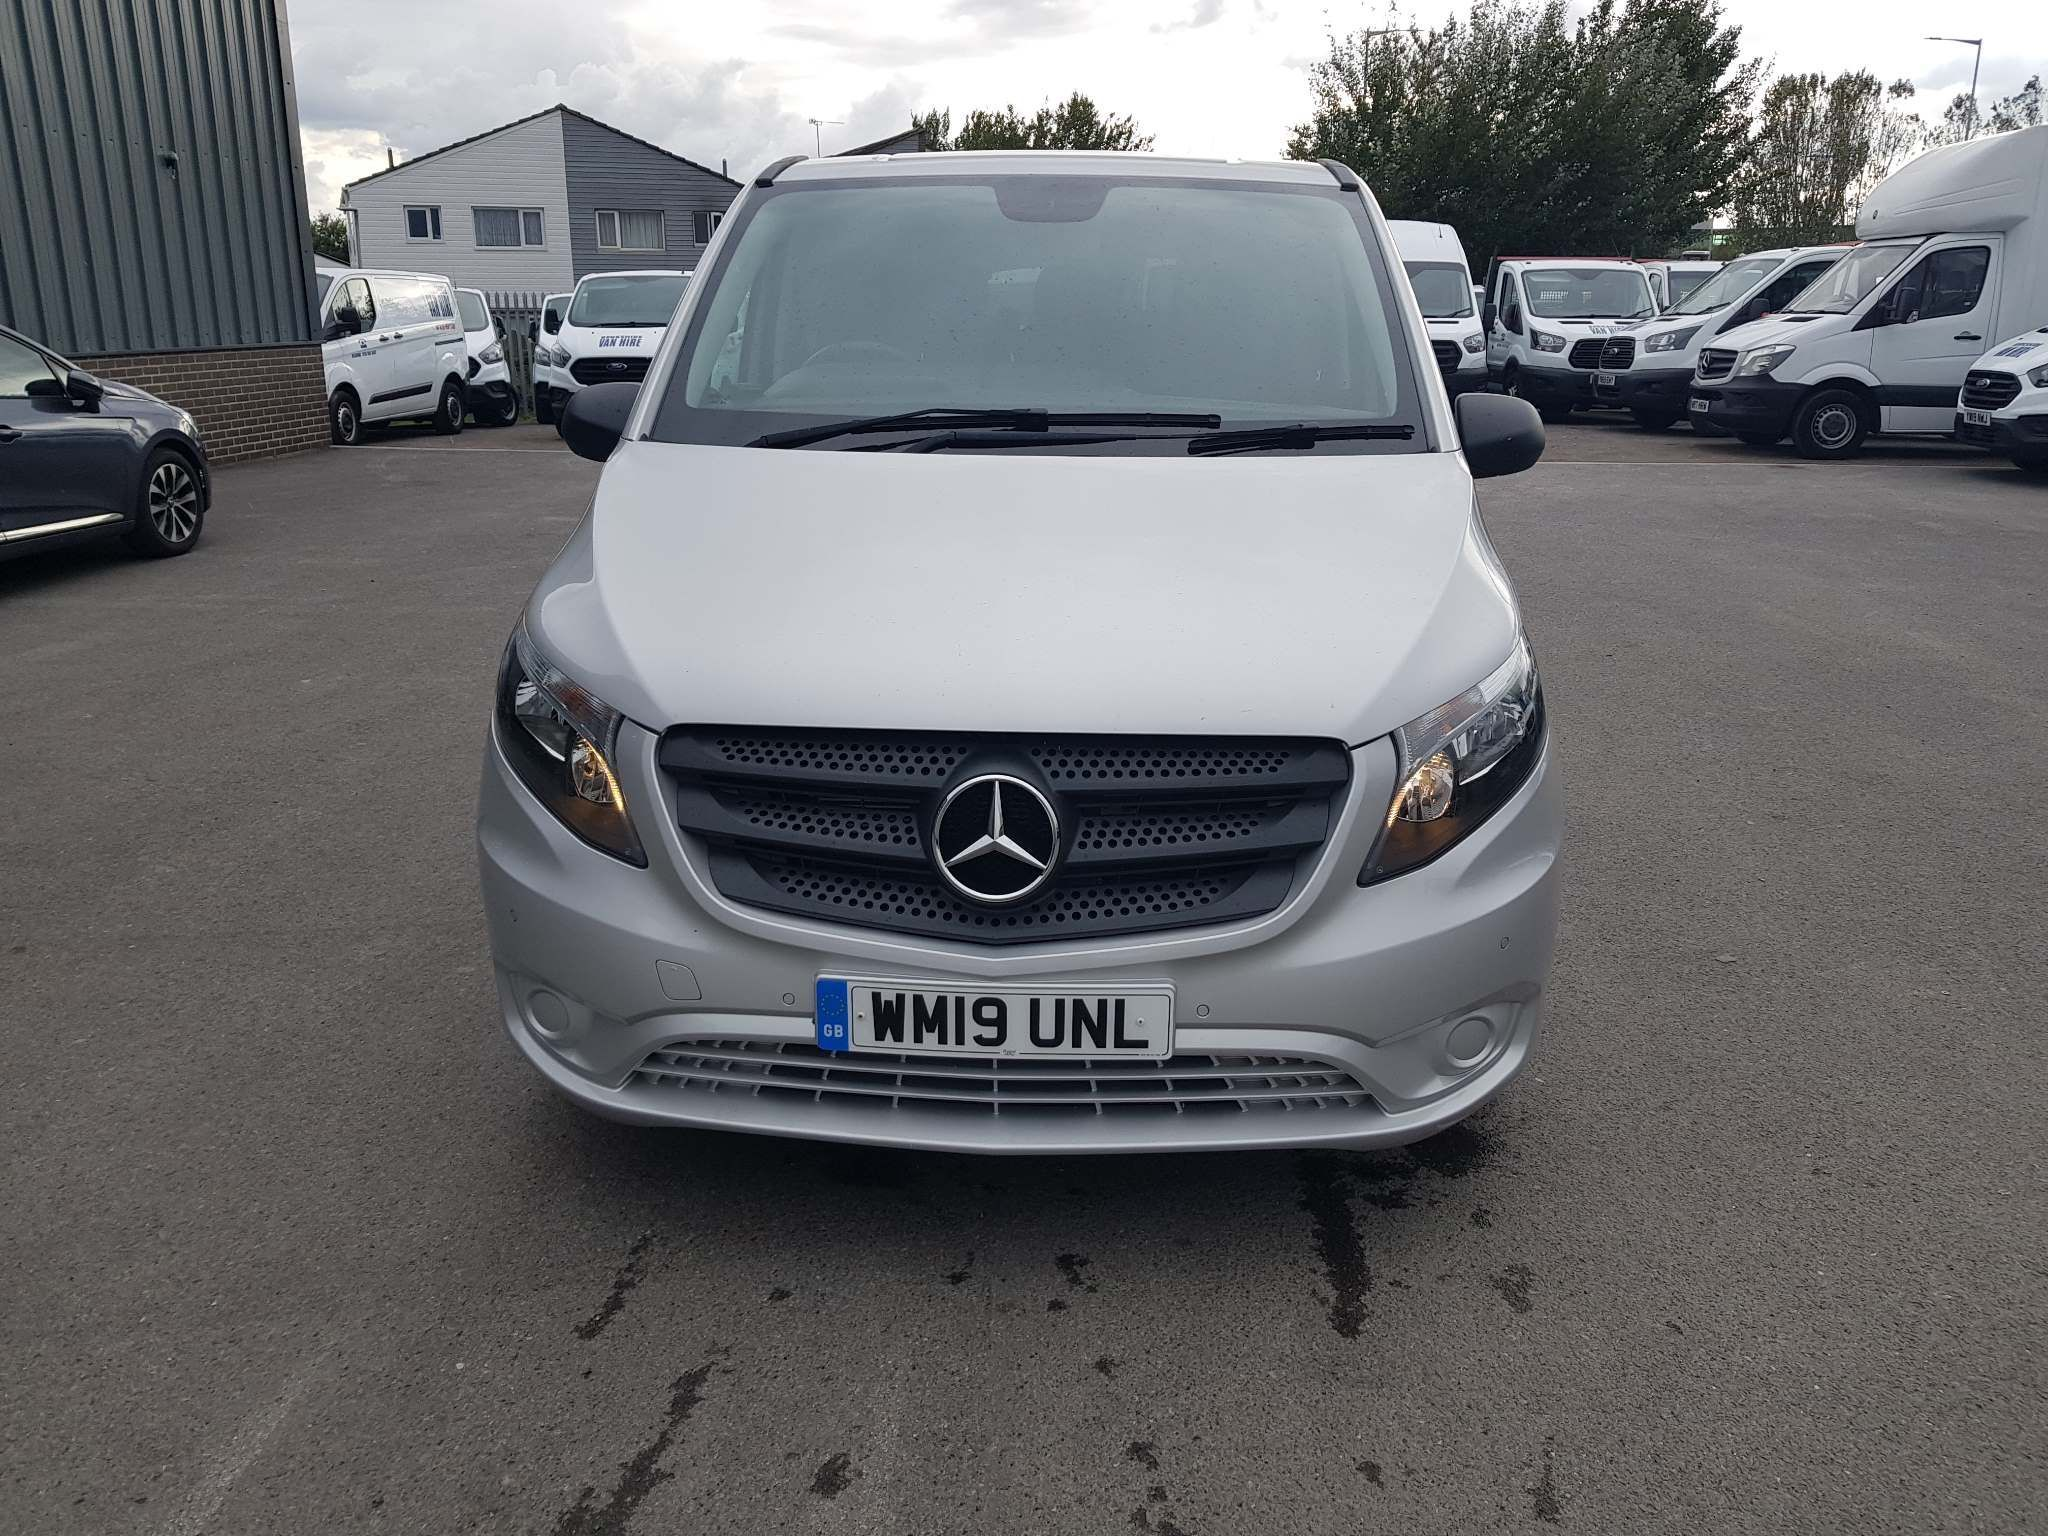 Mercedes-BenzVito2.1 114 CDi SELECT Tourer G Tronic RWD L3 EU6 5dr For Sale